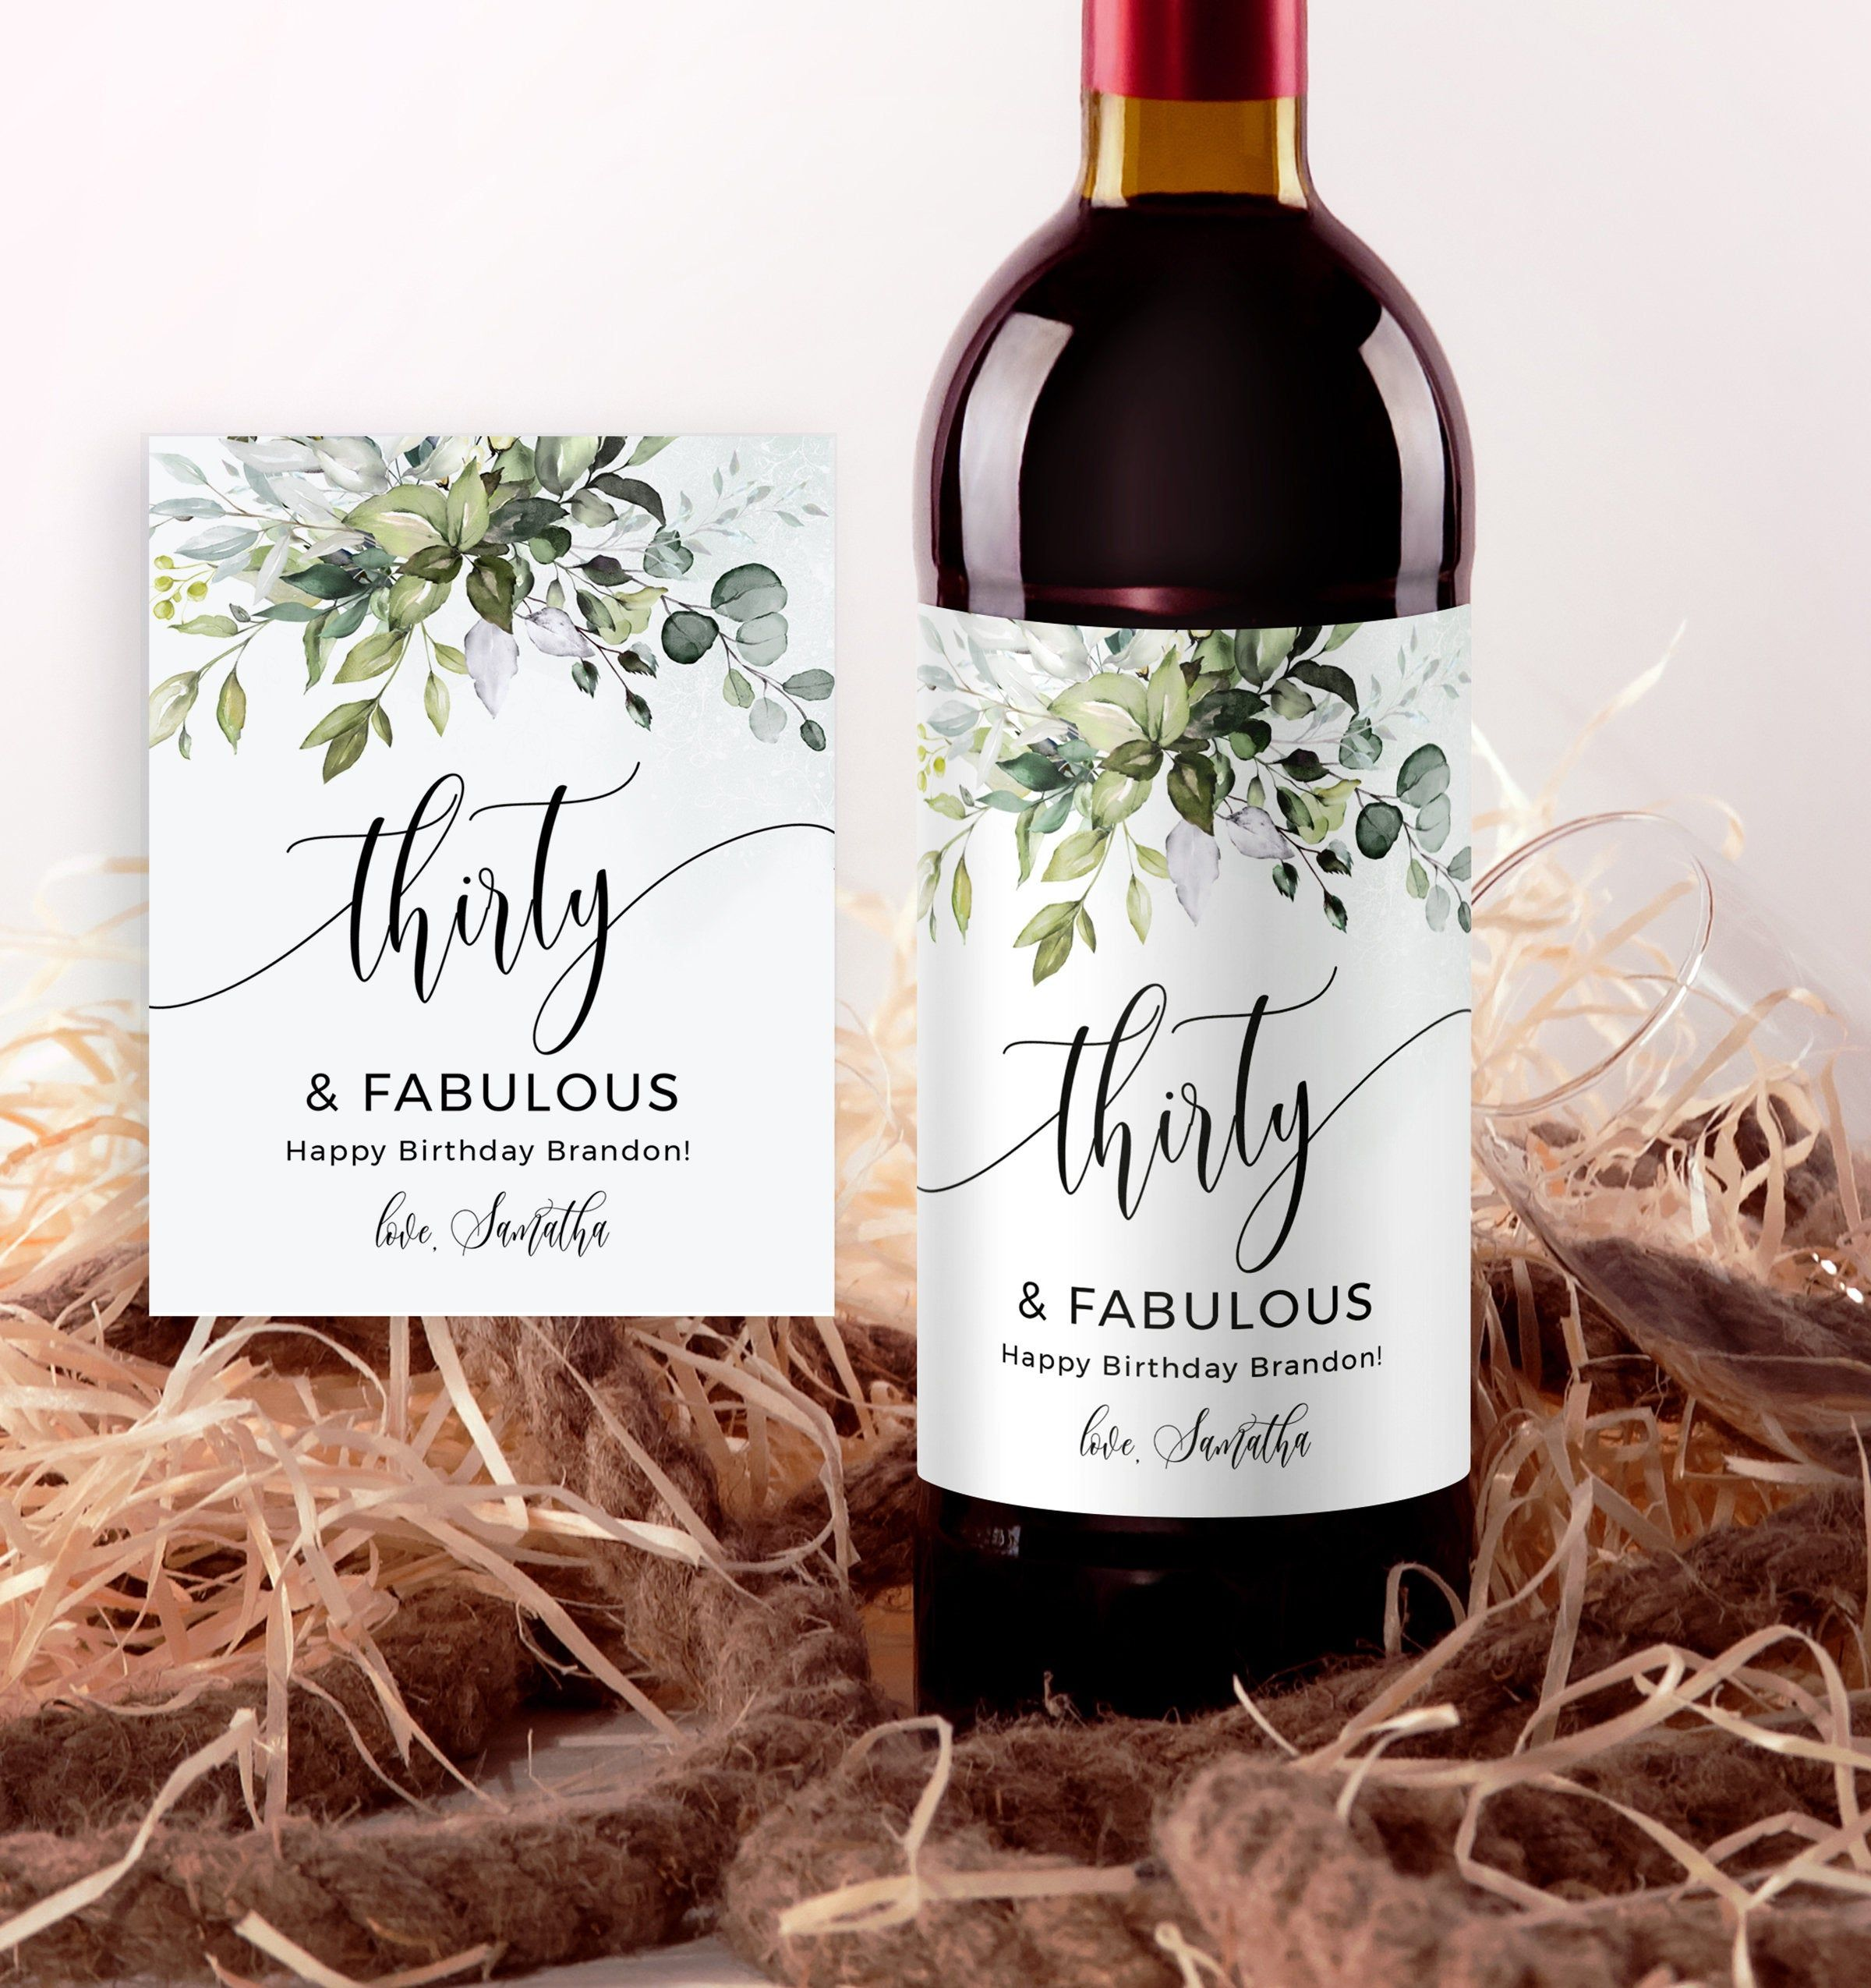 Wine Label Birthday Wine Labels Wine Bottle Label Template Etsy In 2021 Birthday Wine Label Wine Bottle Label Template Birthday Wine